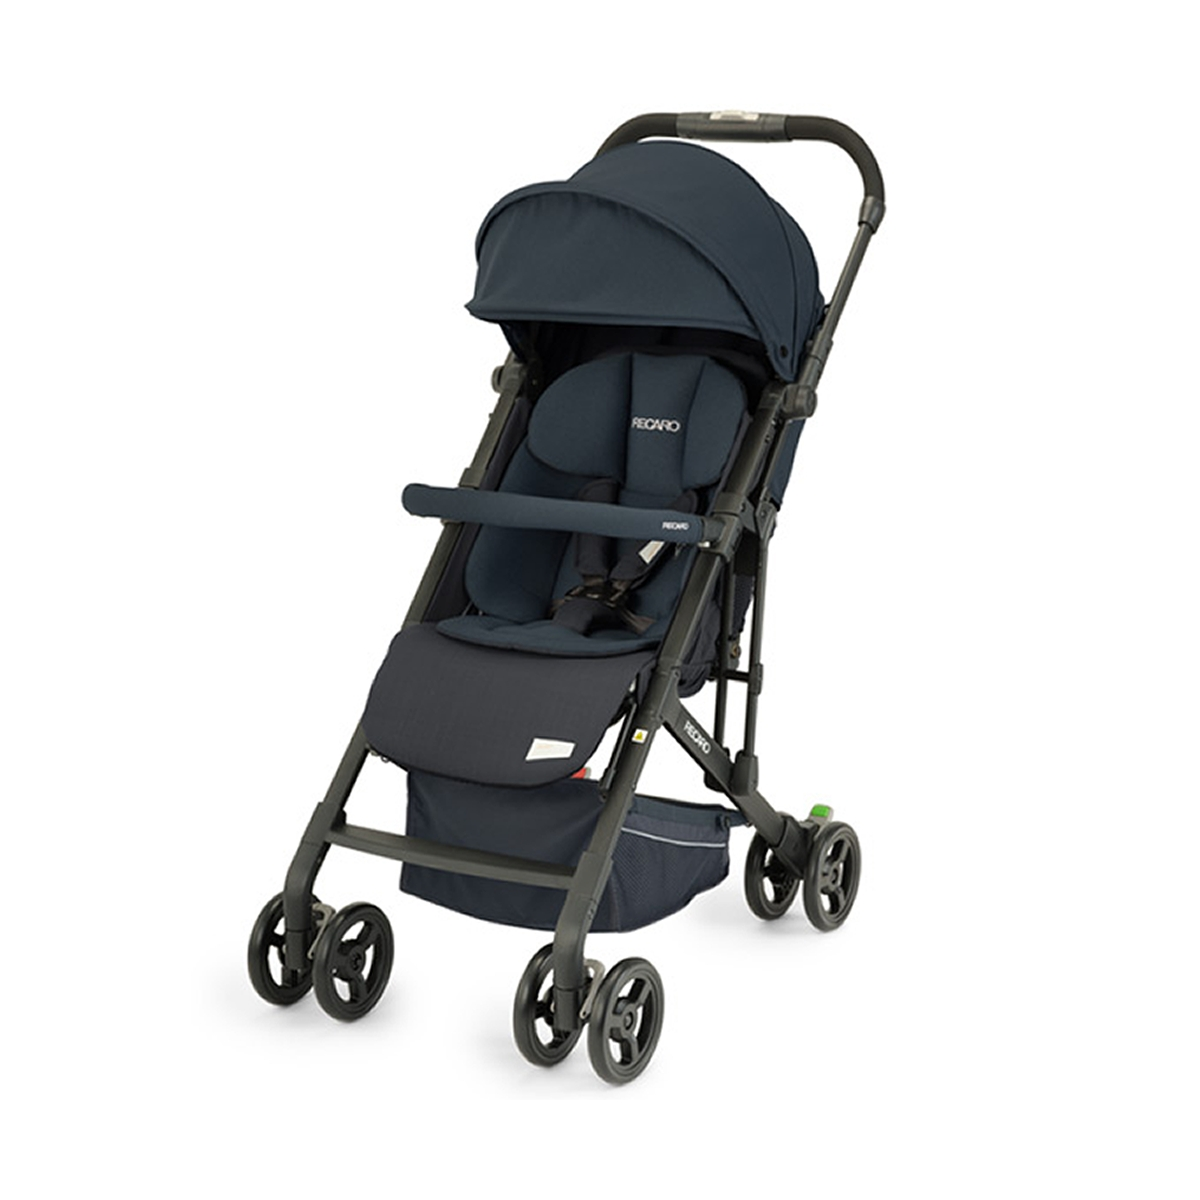 Recaro Easylife Elite 2 Stroller-Matte Black